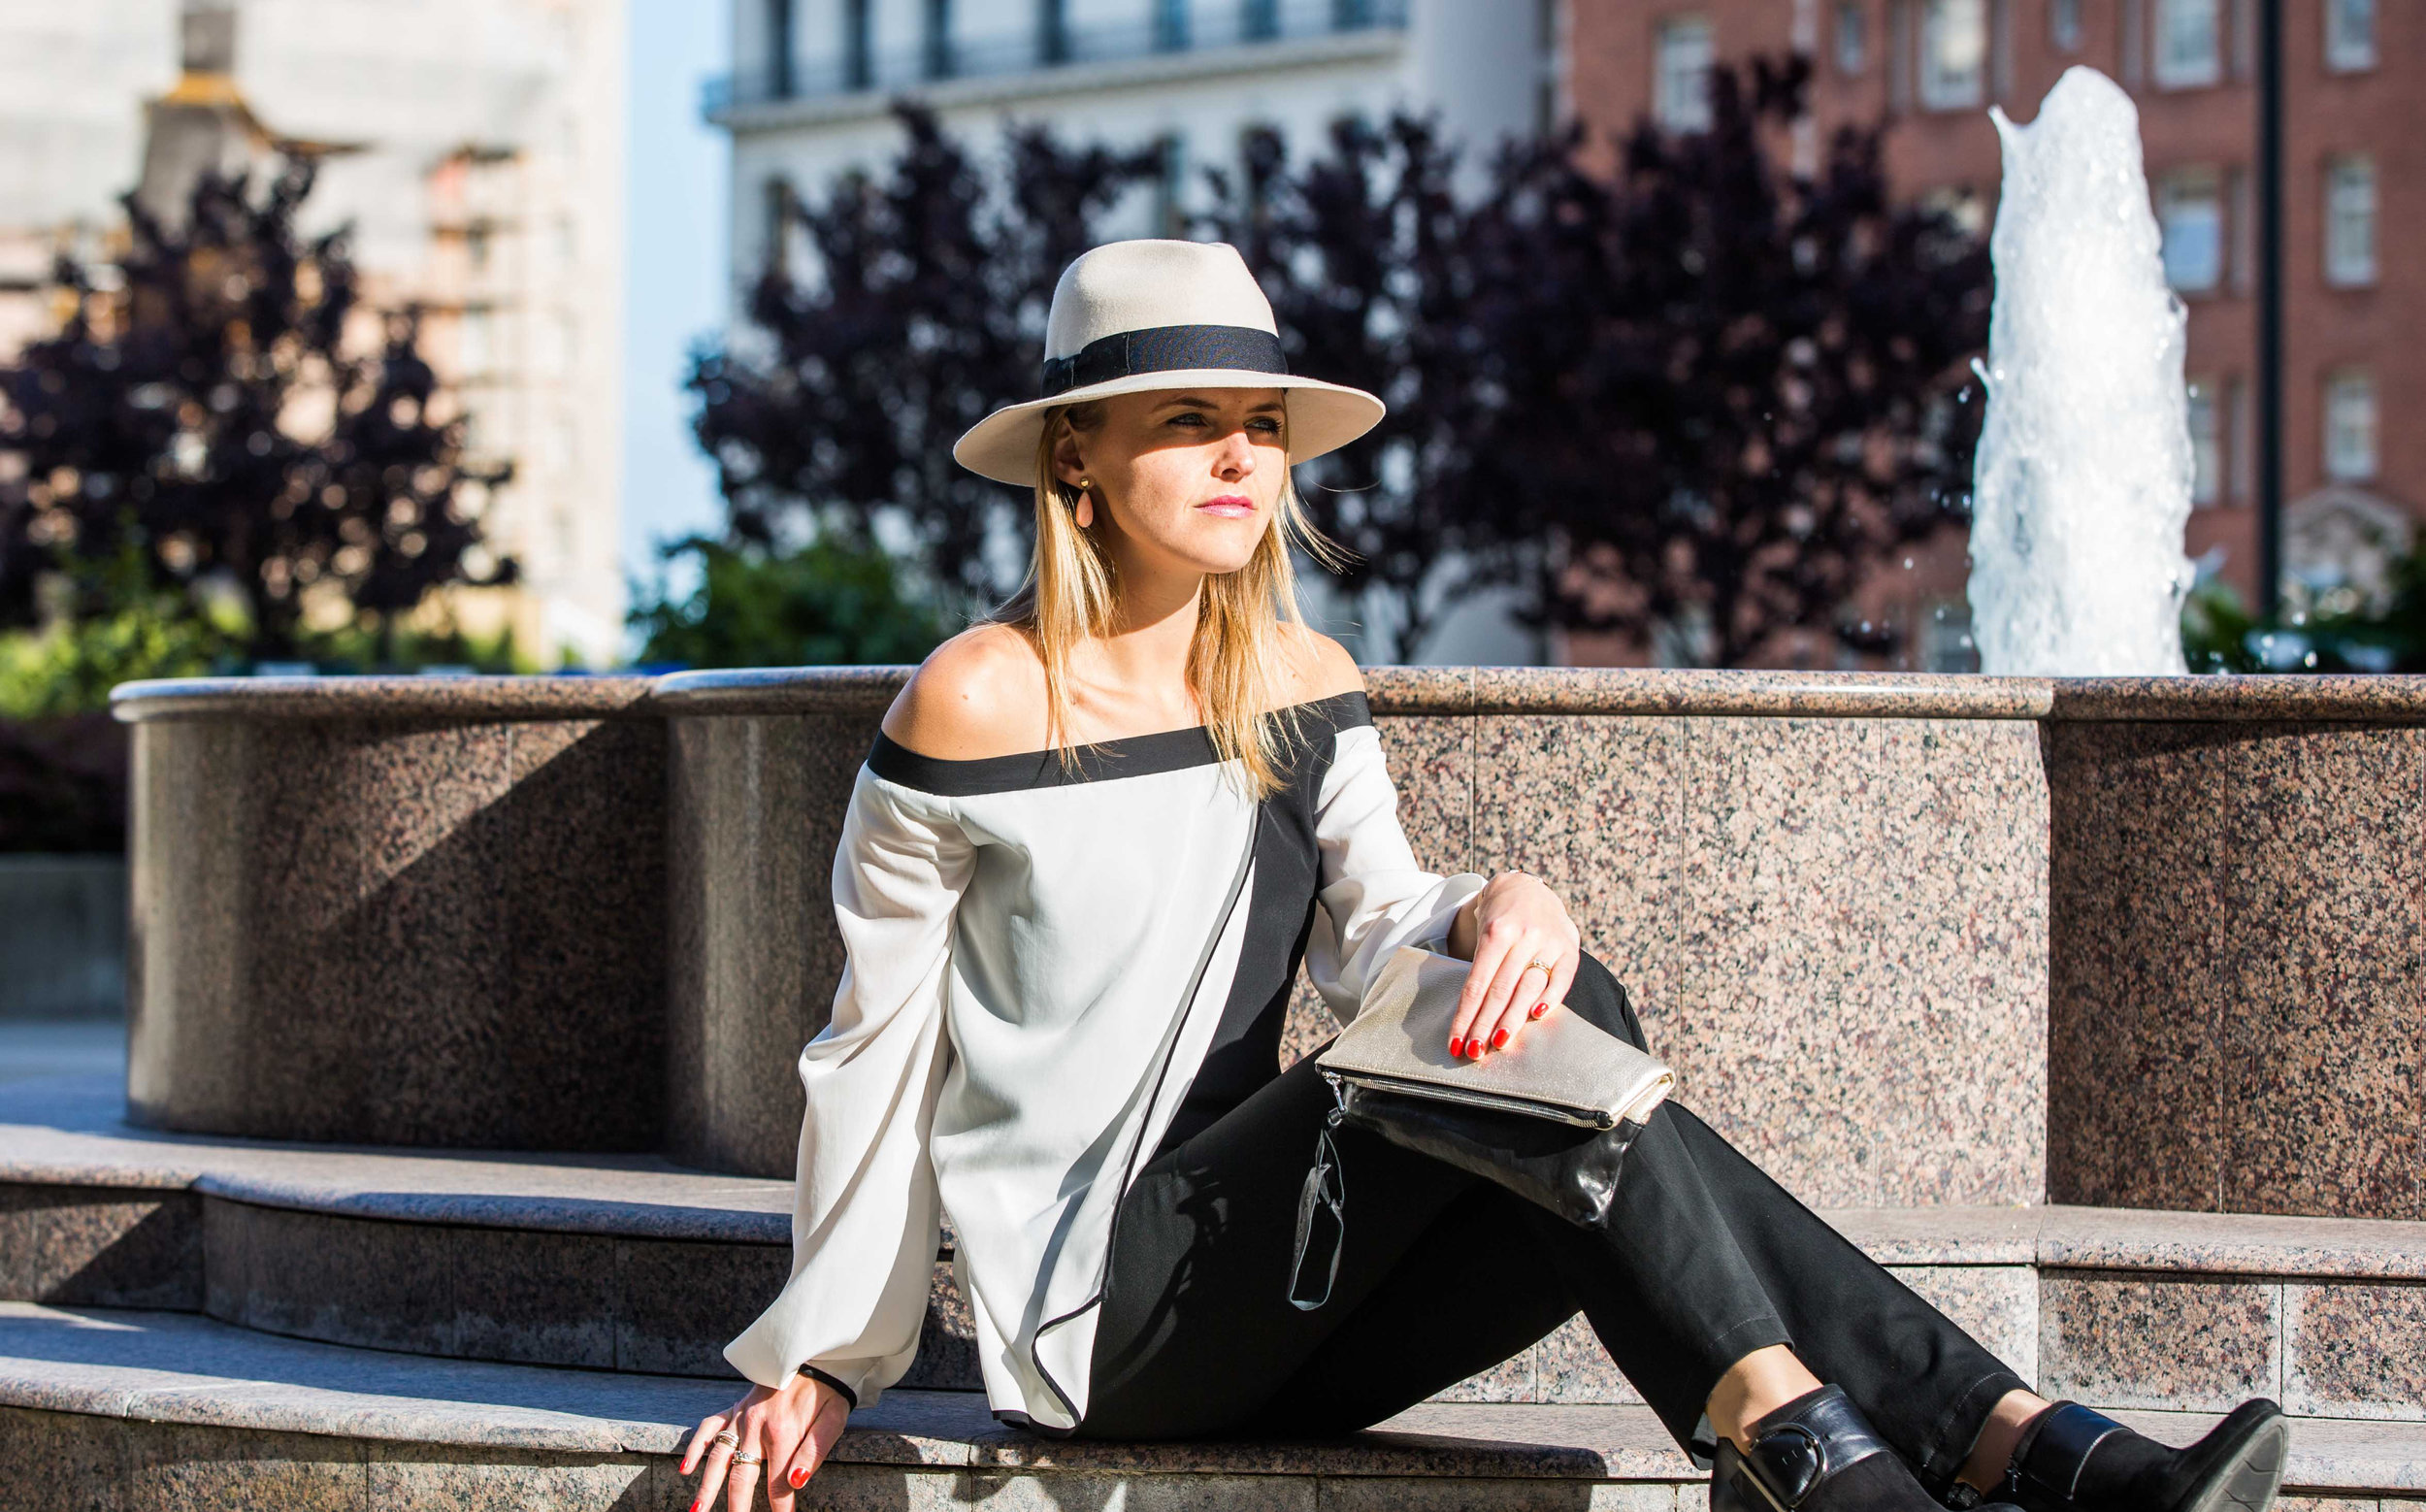 On Susanne -  Alex Hat  |  Alana Top  |  Tara Clutch